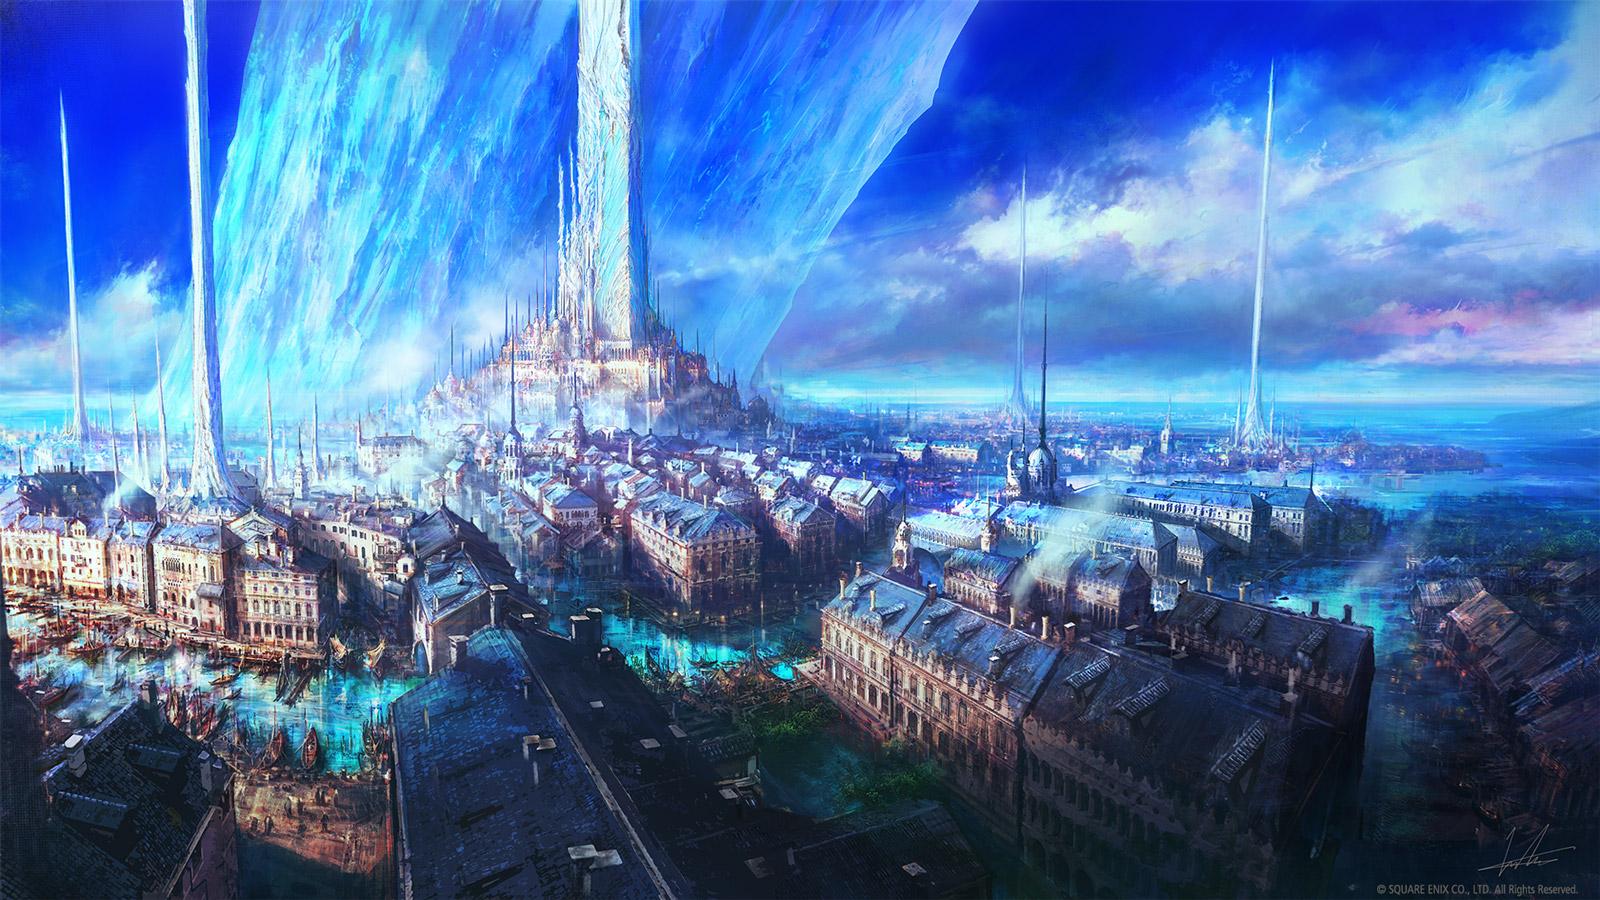 Free Final Fantasy XVI Wallpaper in 1600x900